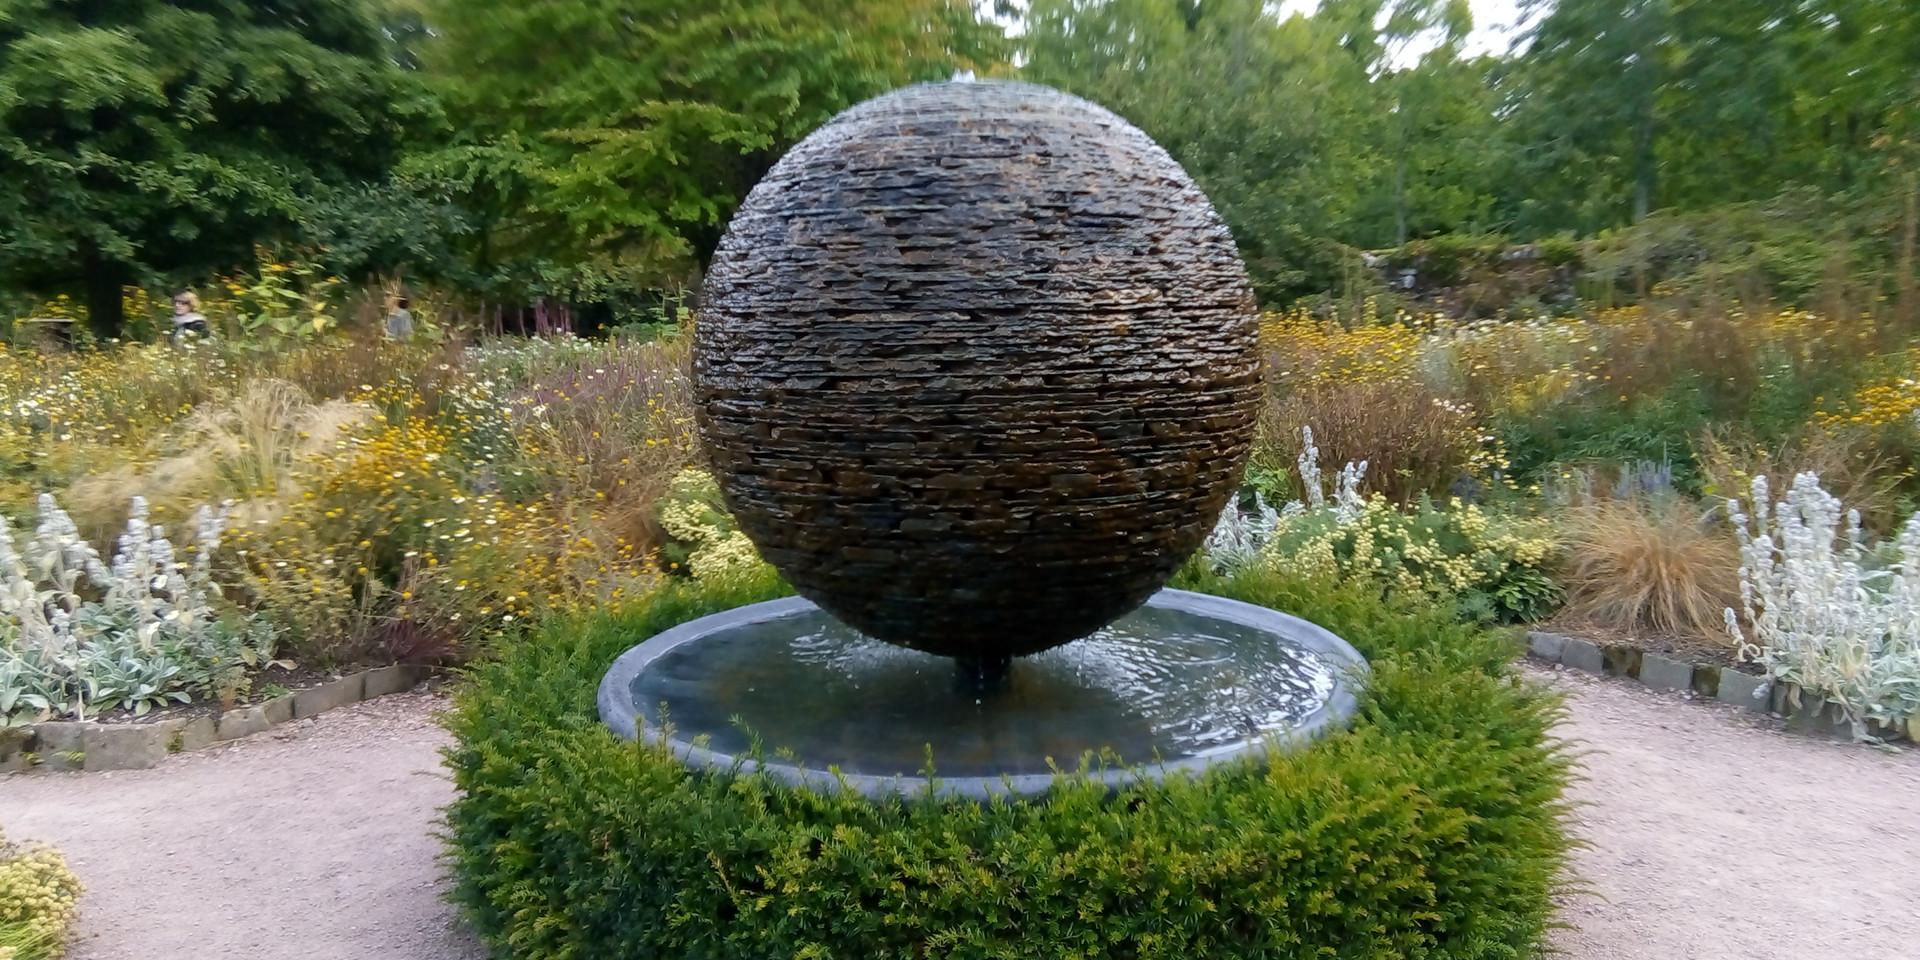 The Cawdor Sphere by Scottish Artist James Parker